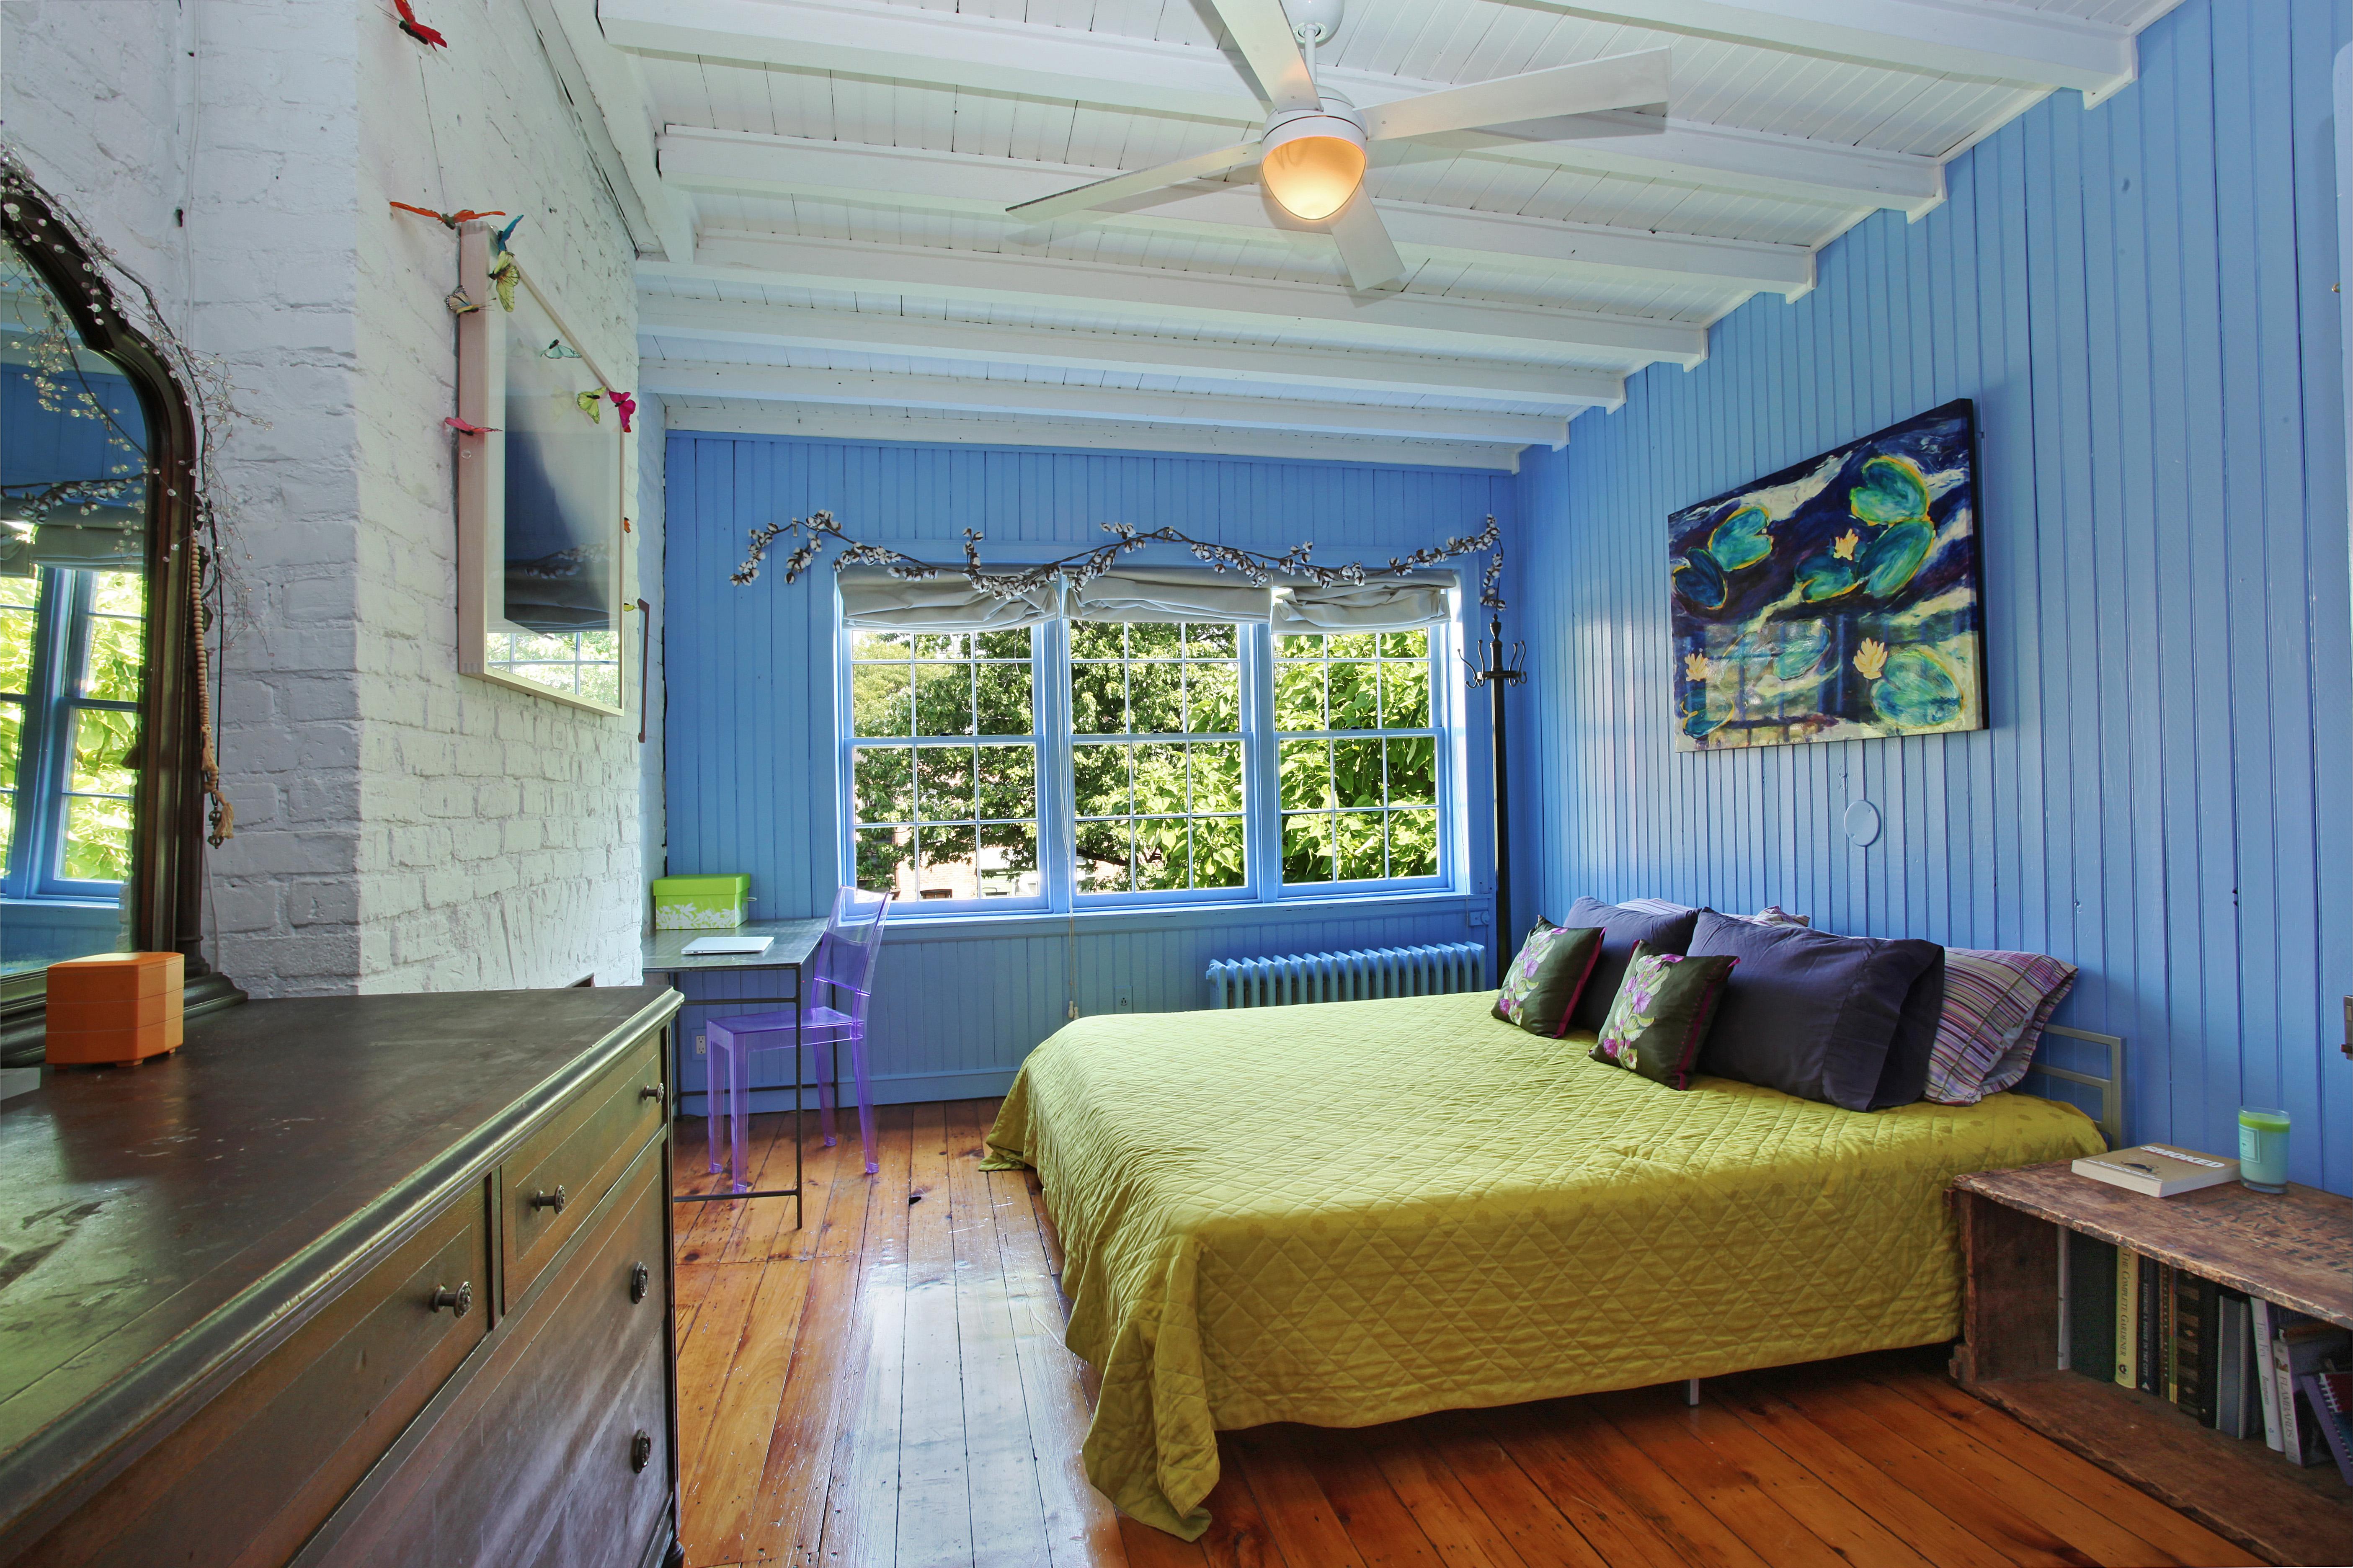 Master Bedroom Oasis - The VHT Studios\' Blog